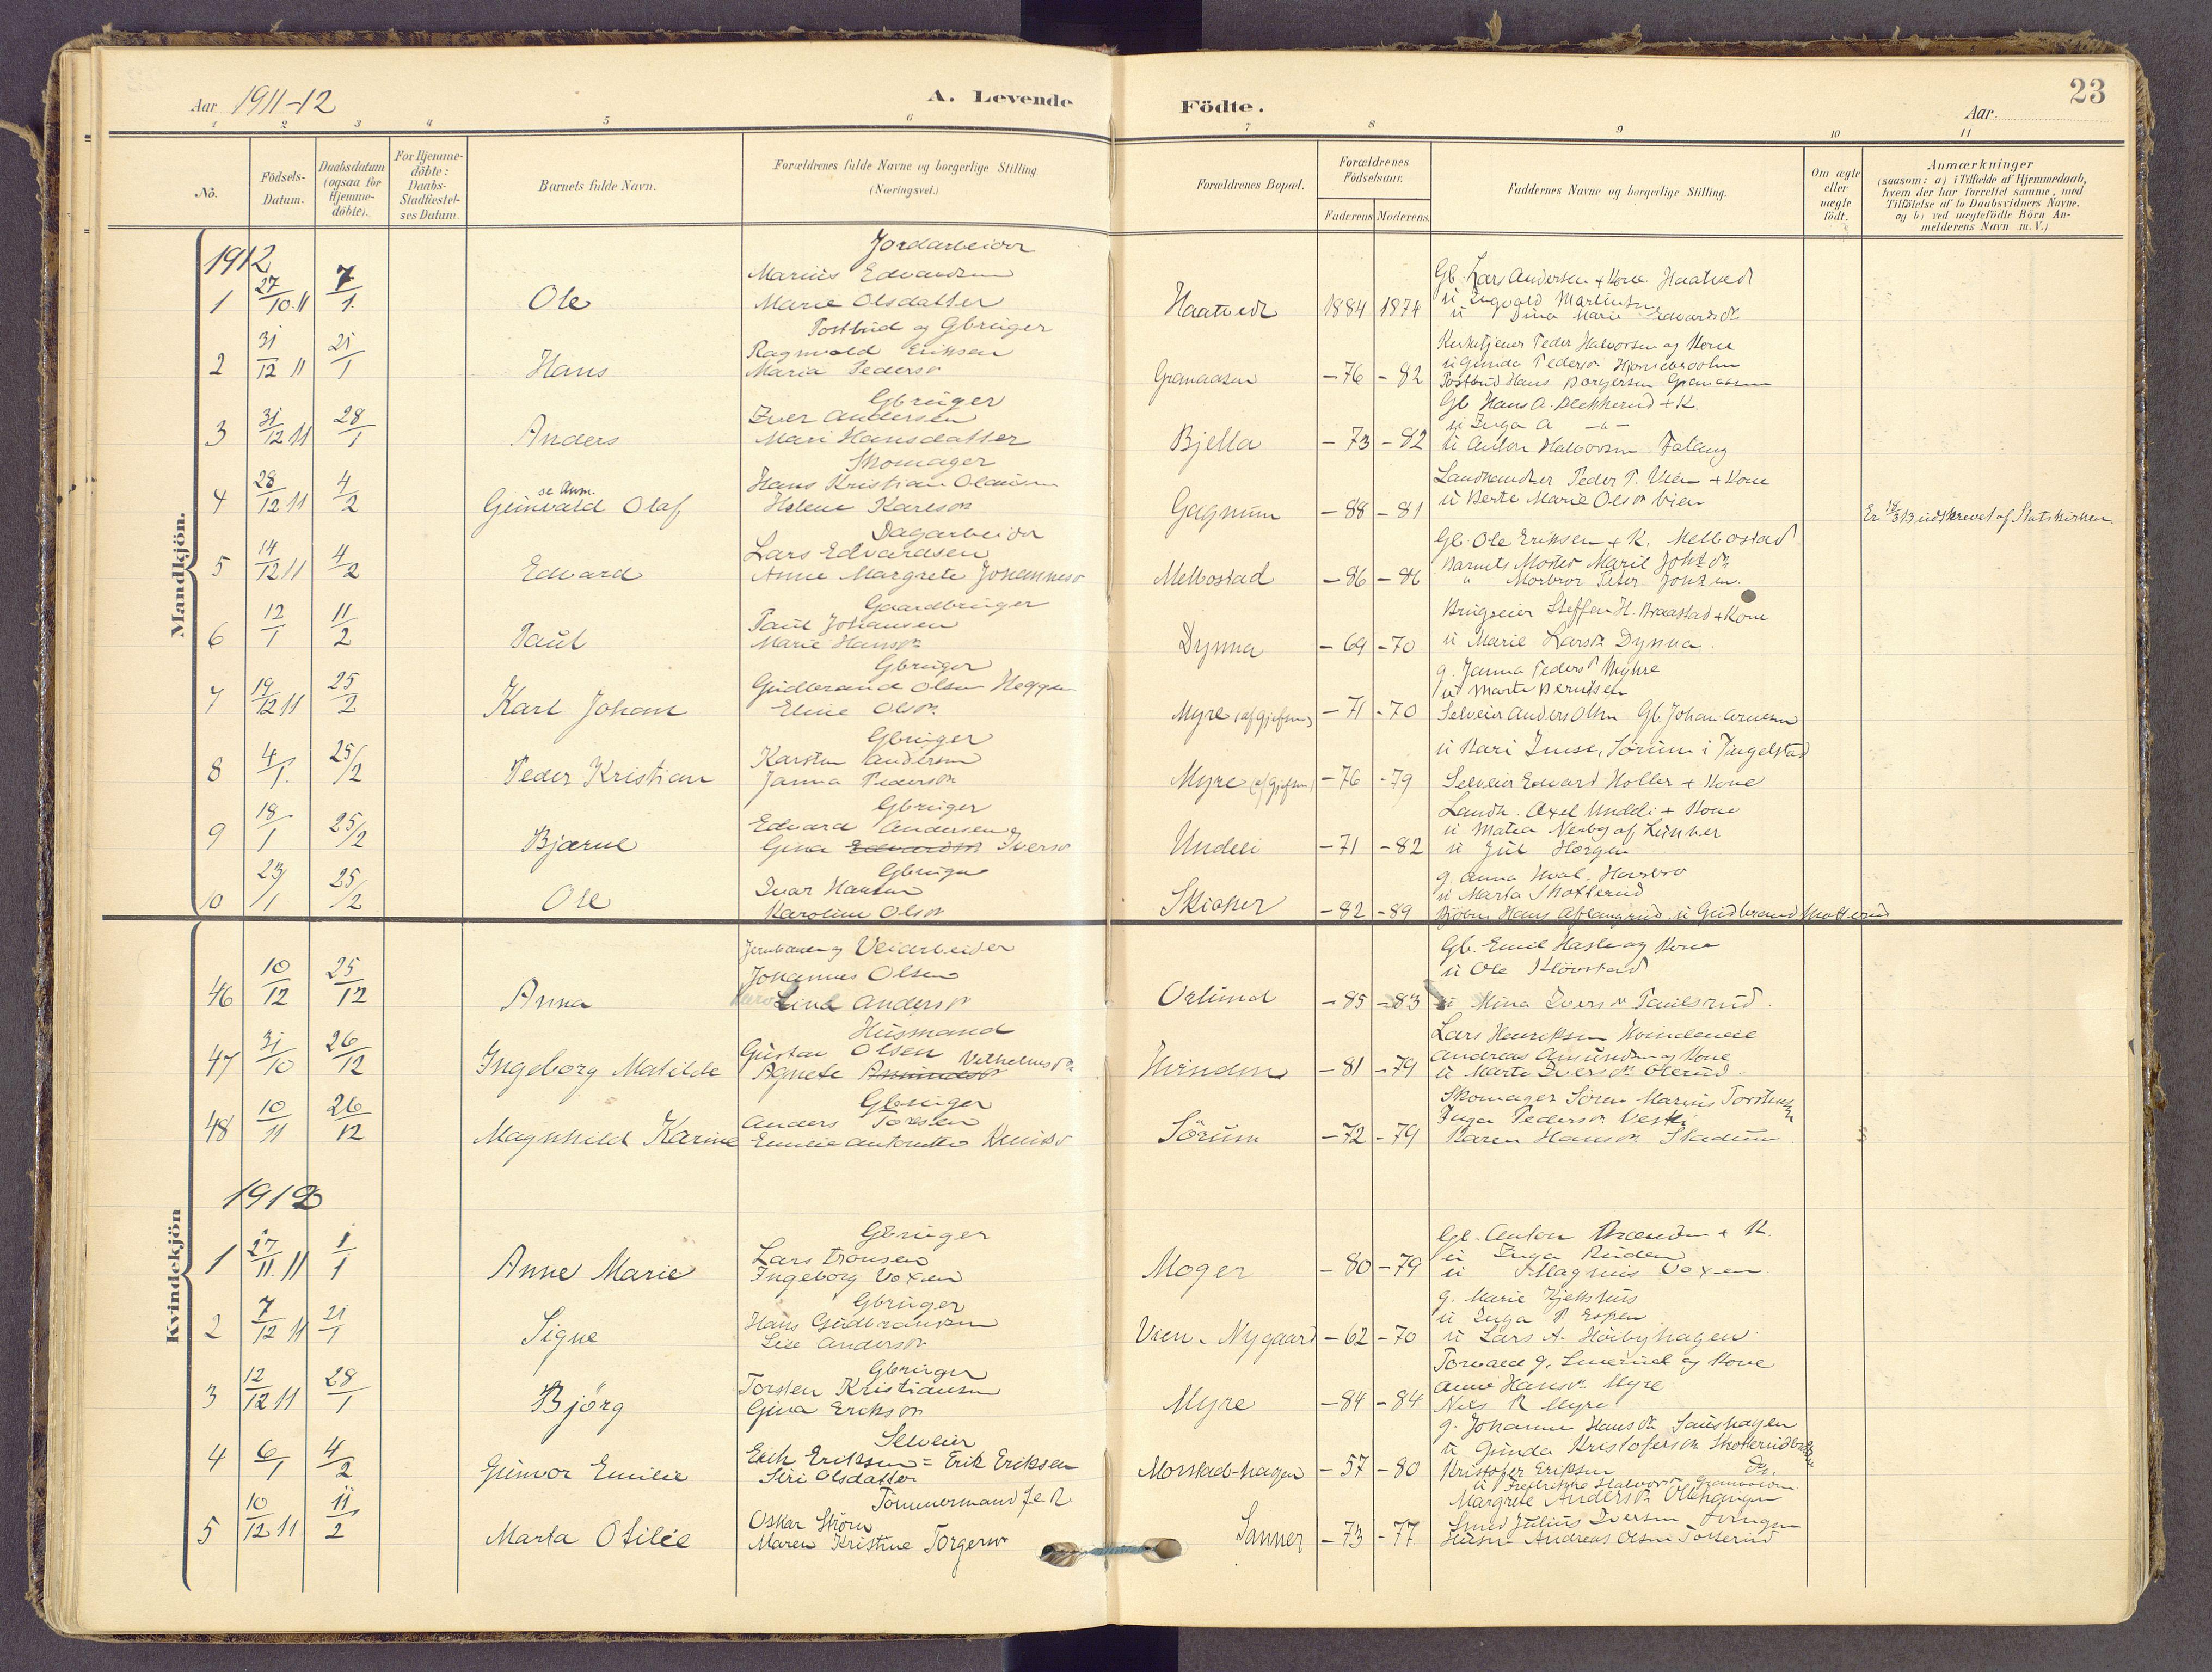 SAH, Gran prestekontor, Ministerialbok nr. 21, 1908-1932, s. 23